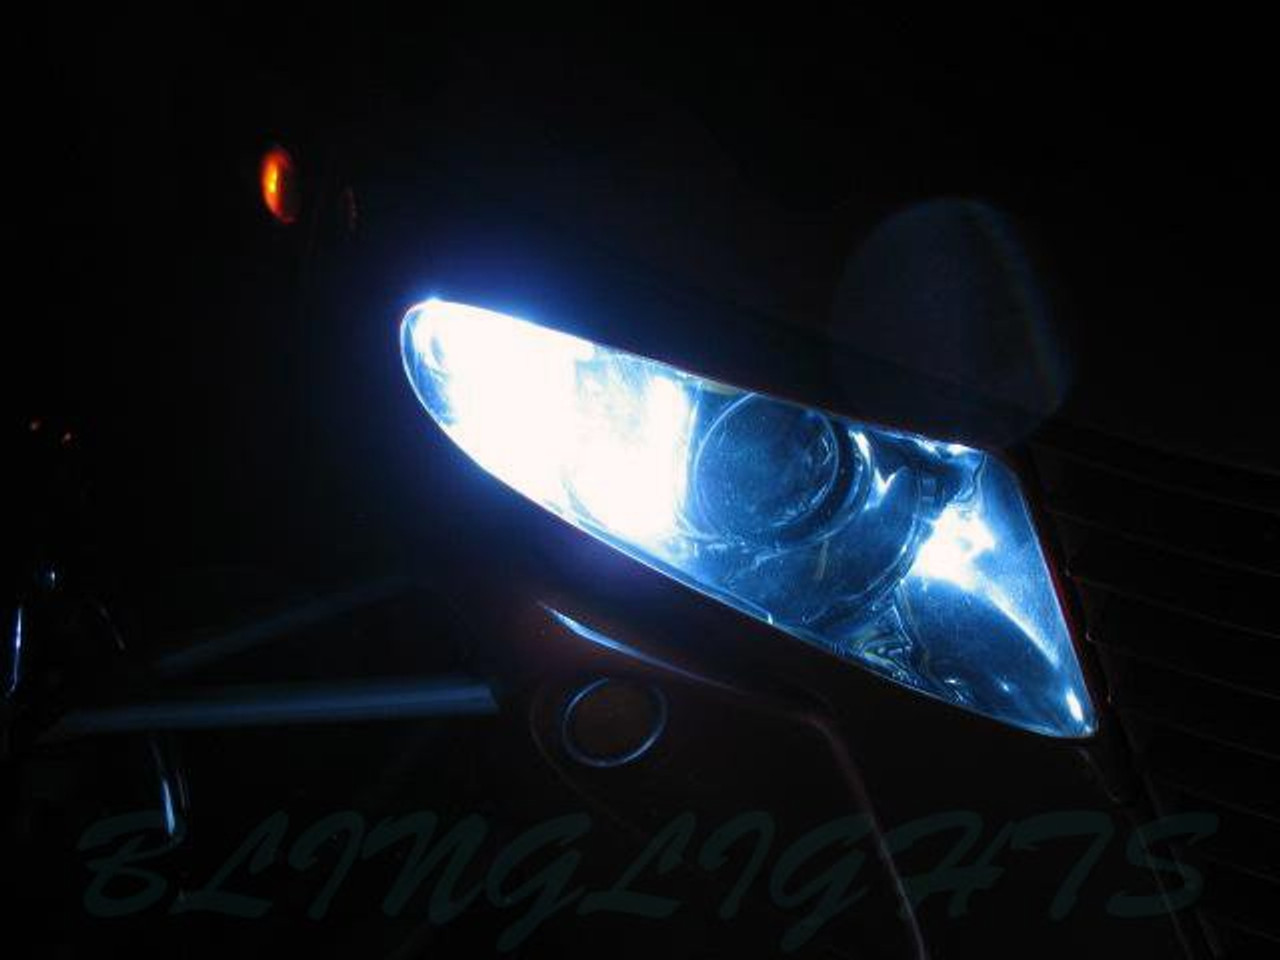 1997-2002 chrysler plymouth prowler xenon 55watt hid conversion kit for  headlamps headlights upgrade - blinglights com